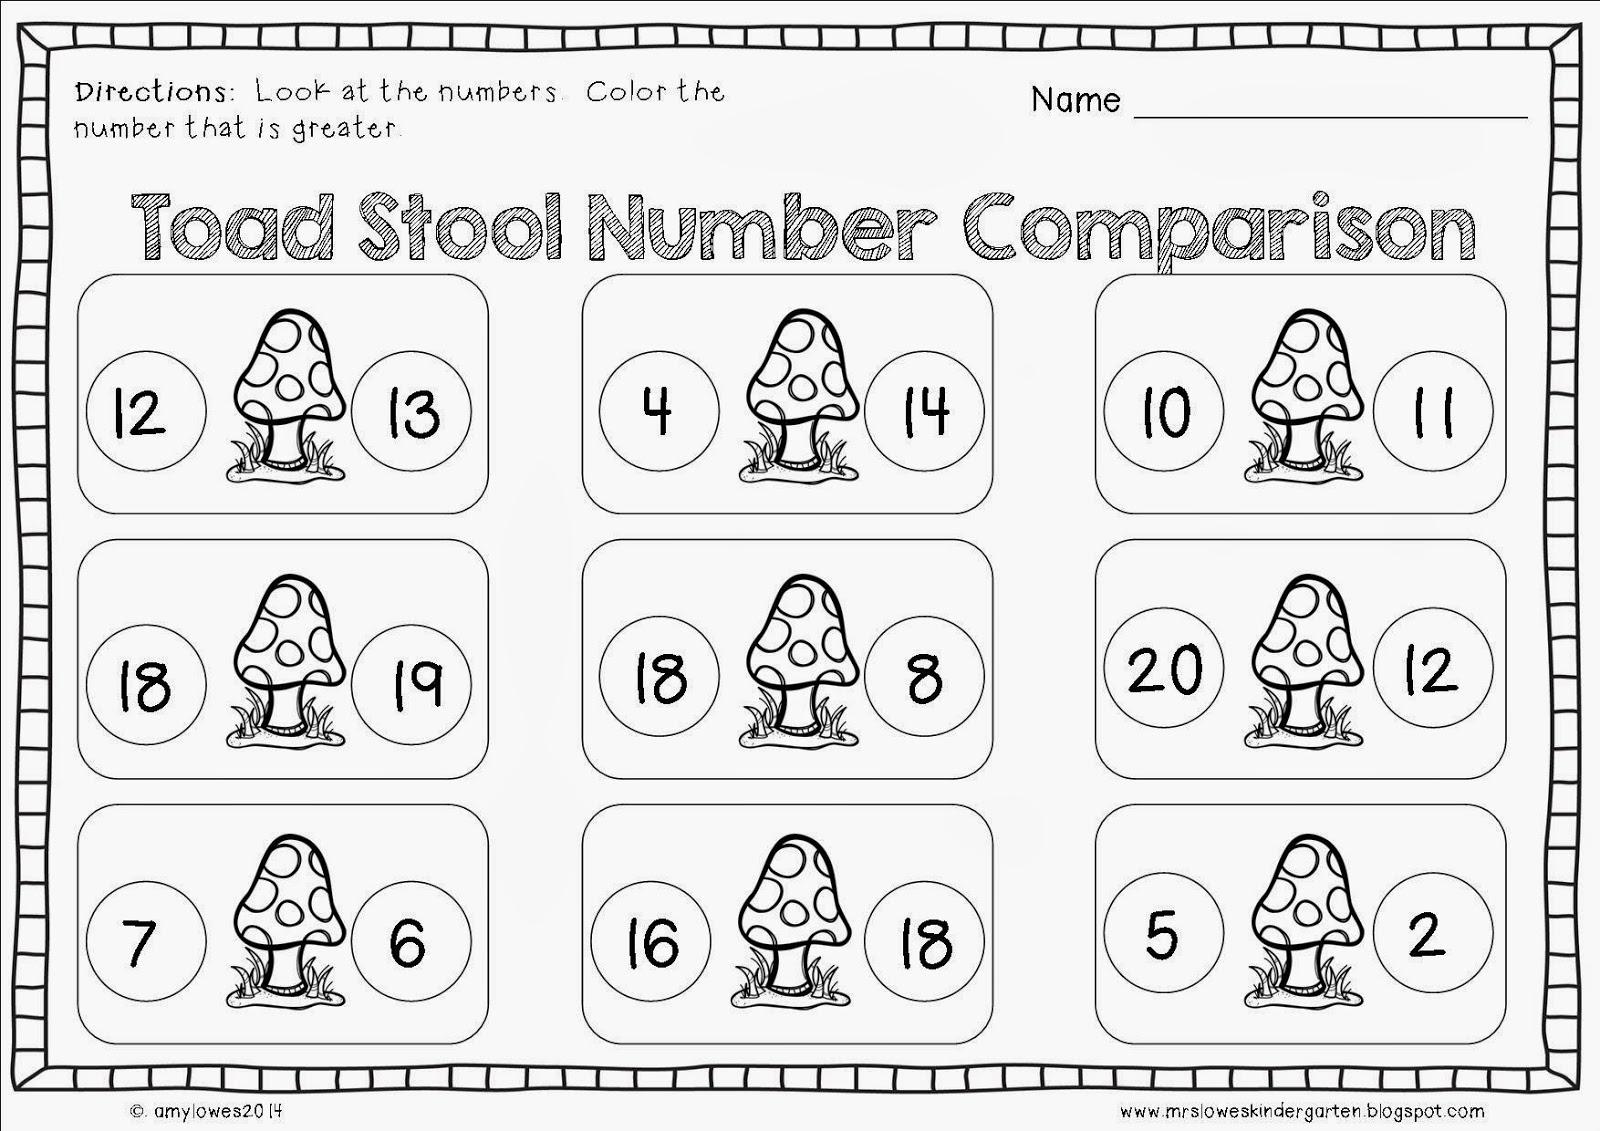 Mrs. Lowes' Kindergarten Korner: Everyone's a Winner! No